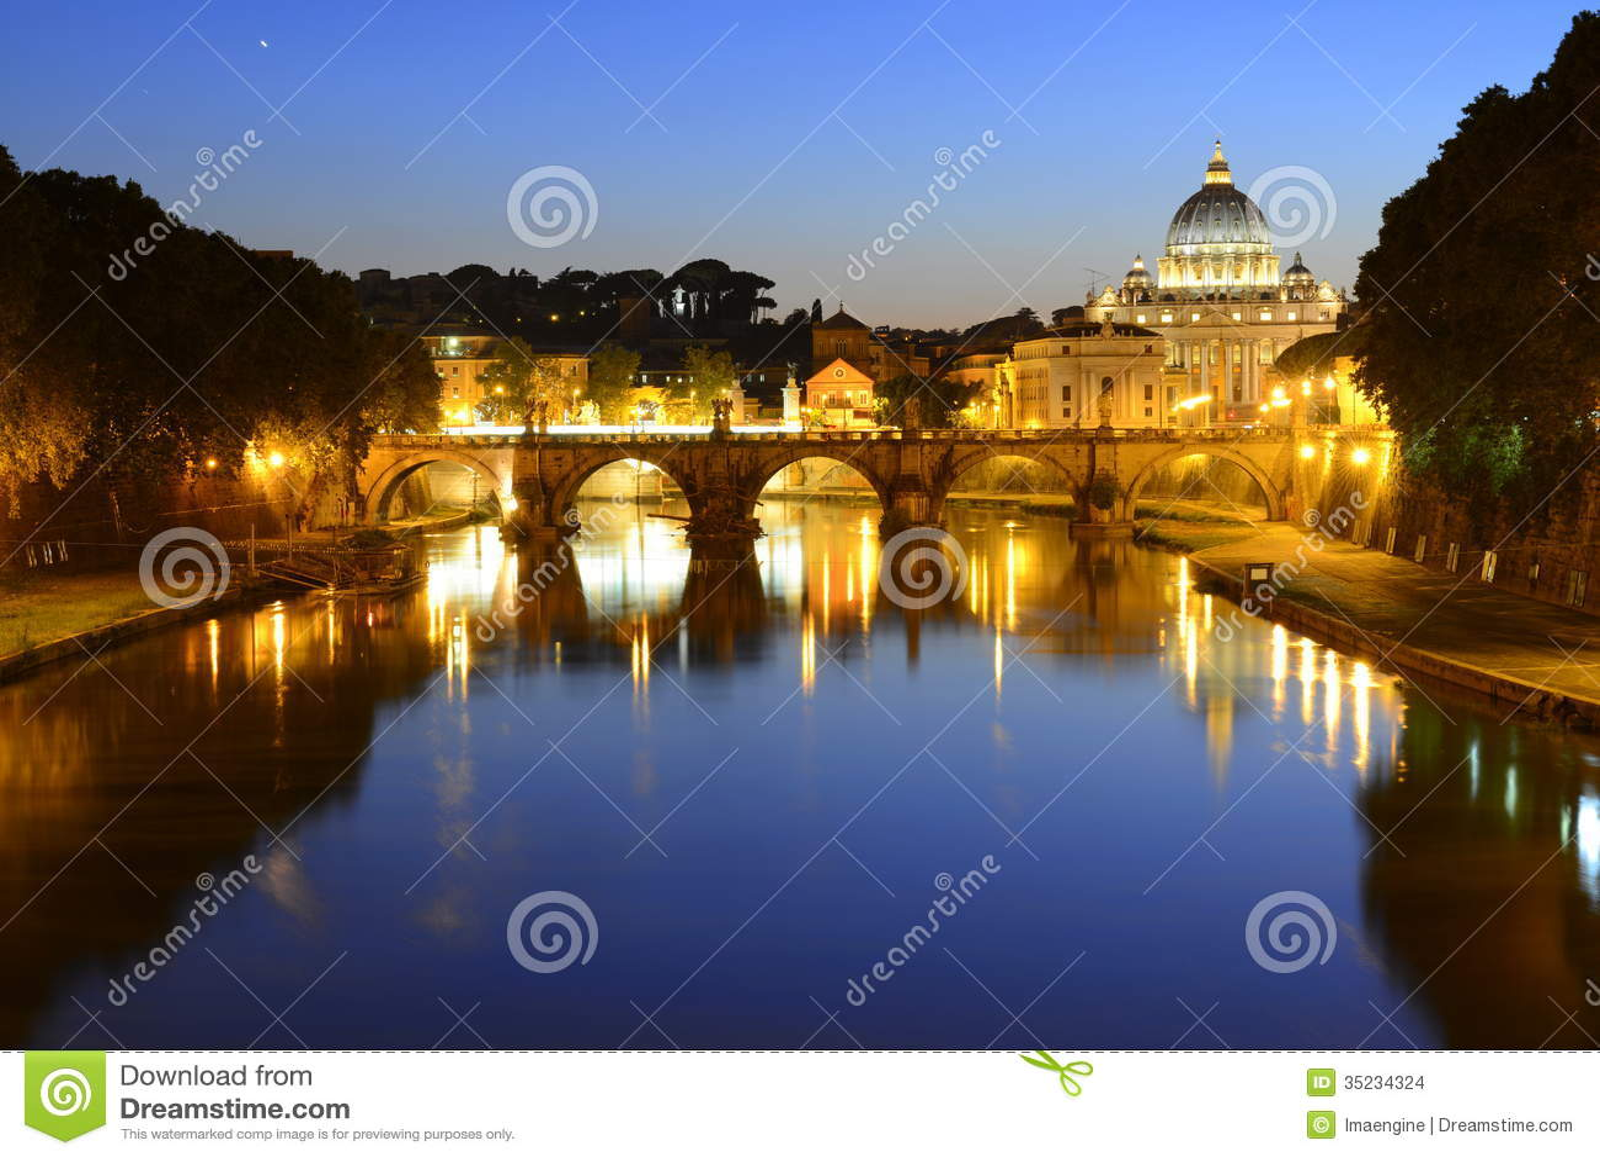 Rome, Italy, Basilica di San Pietro and Sant Angelo bridge at night